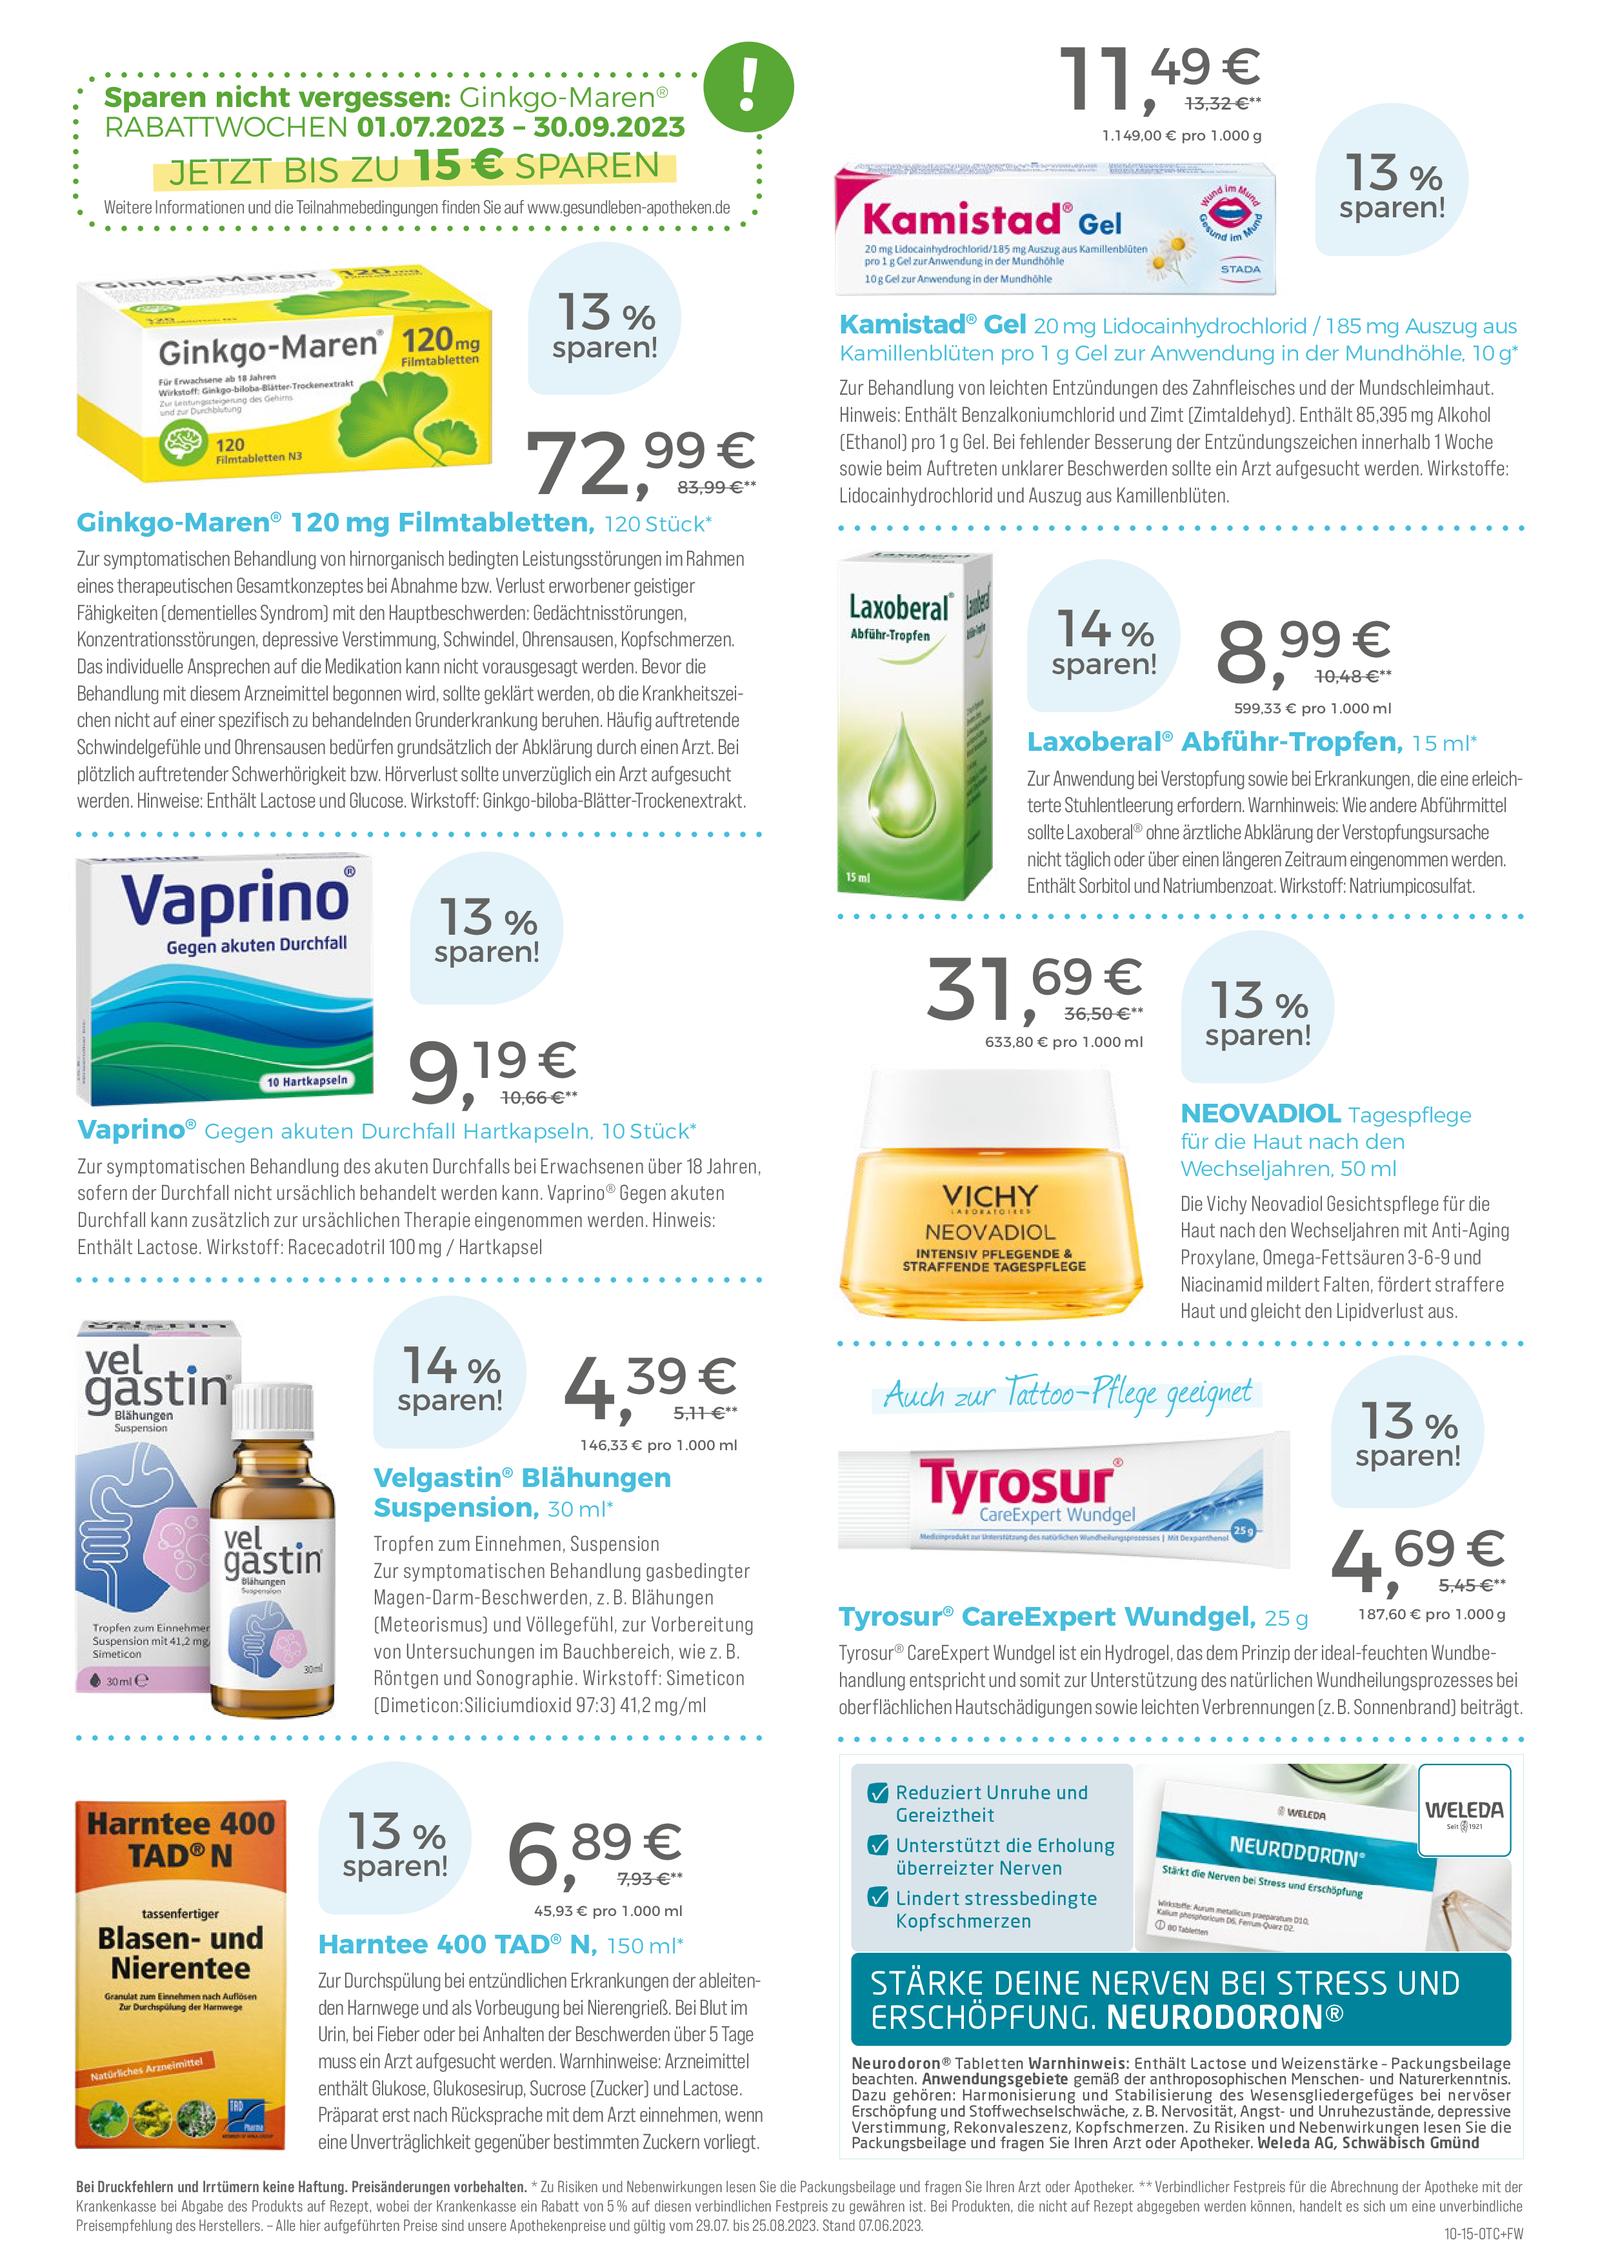 https://mein-uploads.apocdn.net/29205/leaflets/gesundleben_niedrig-Seite3.png